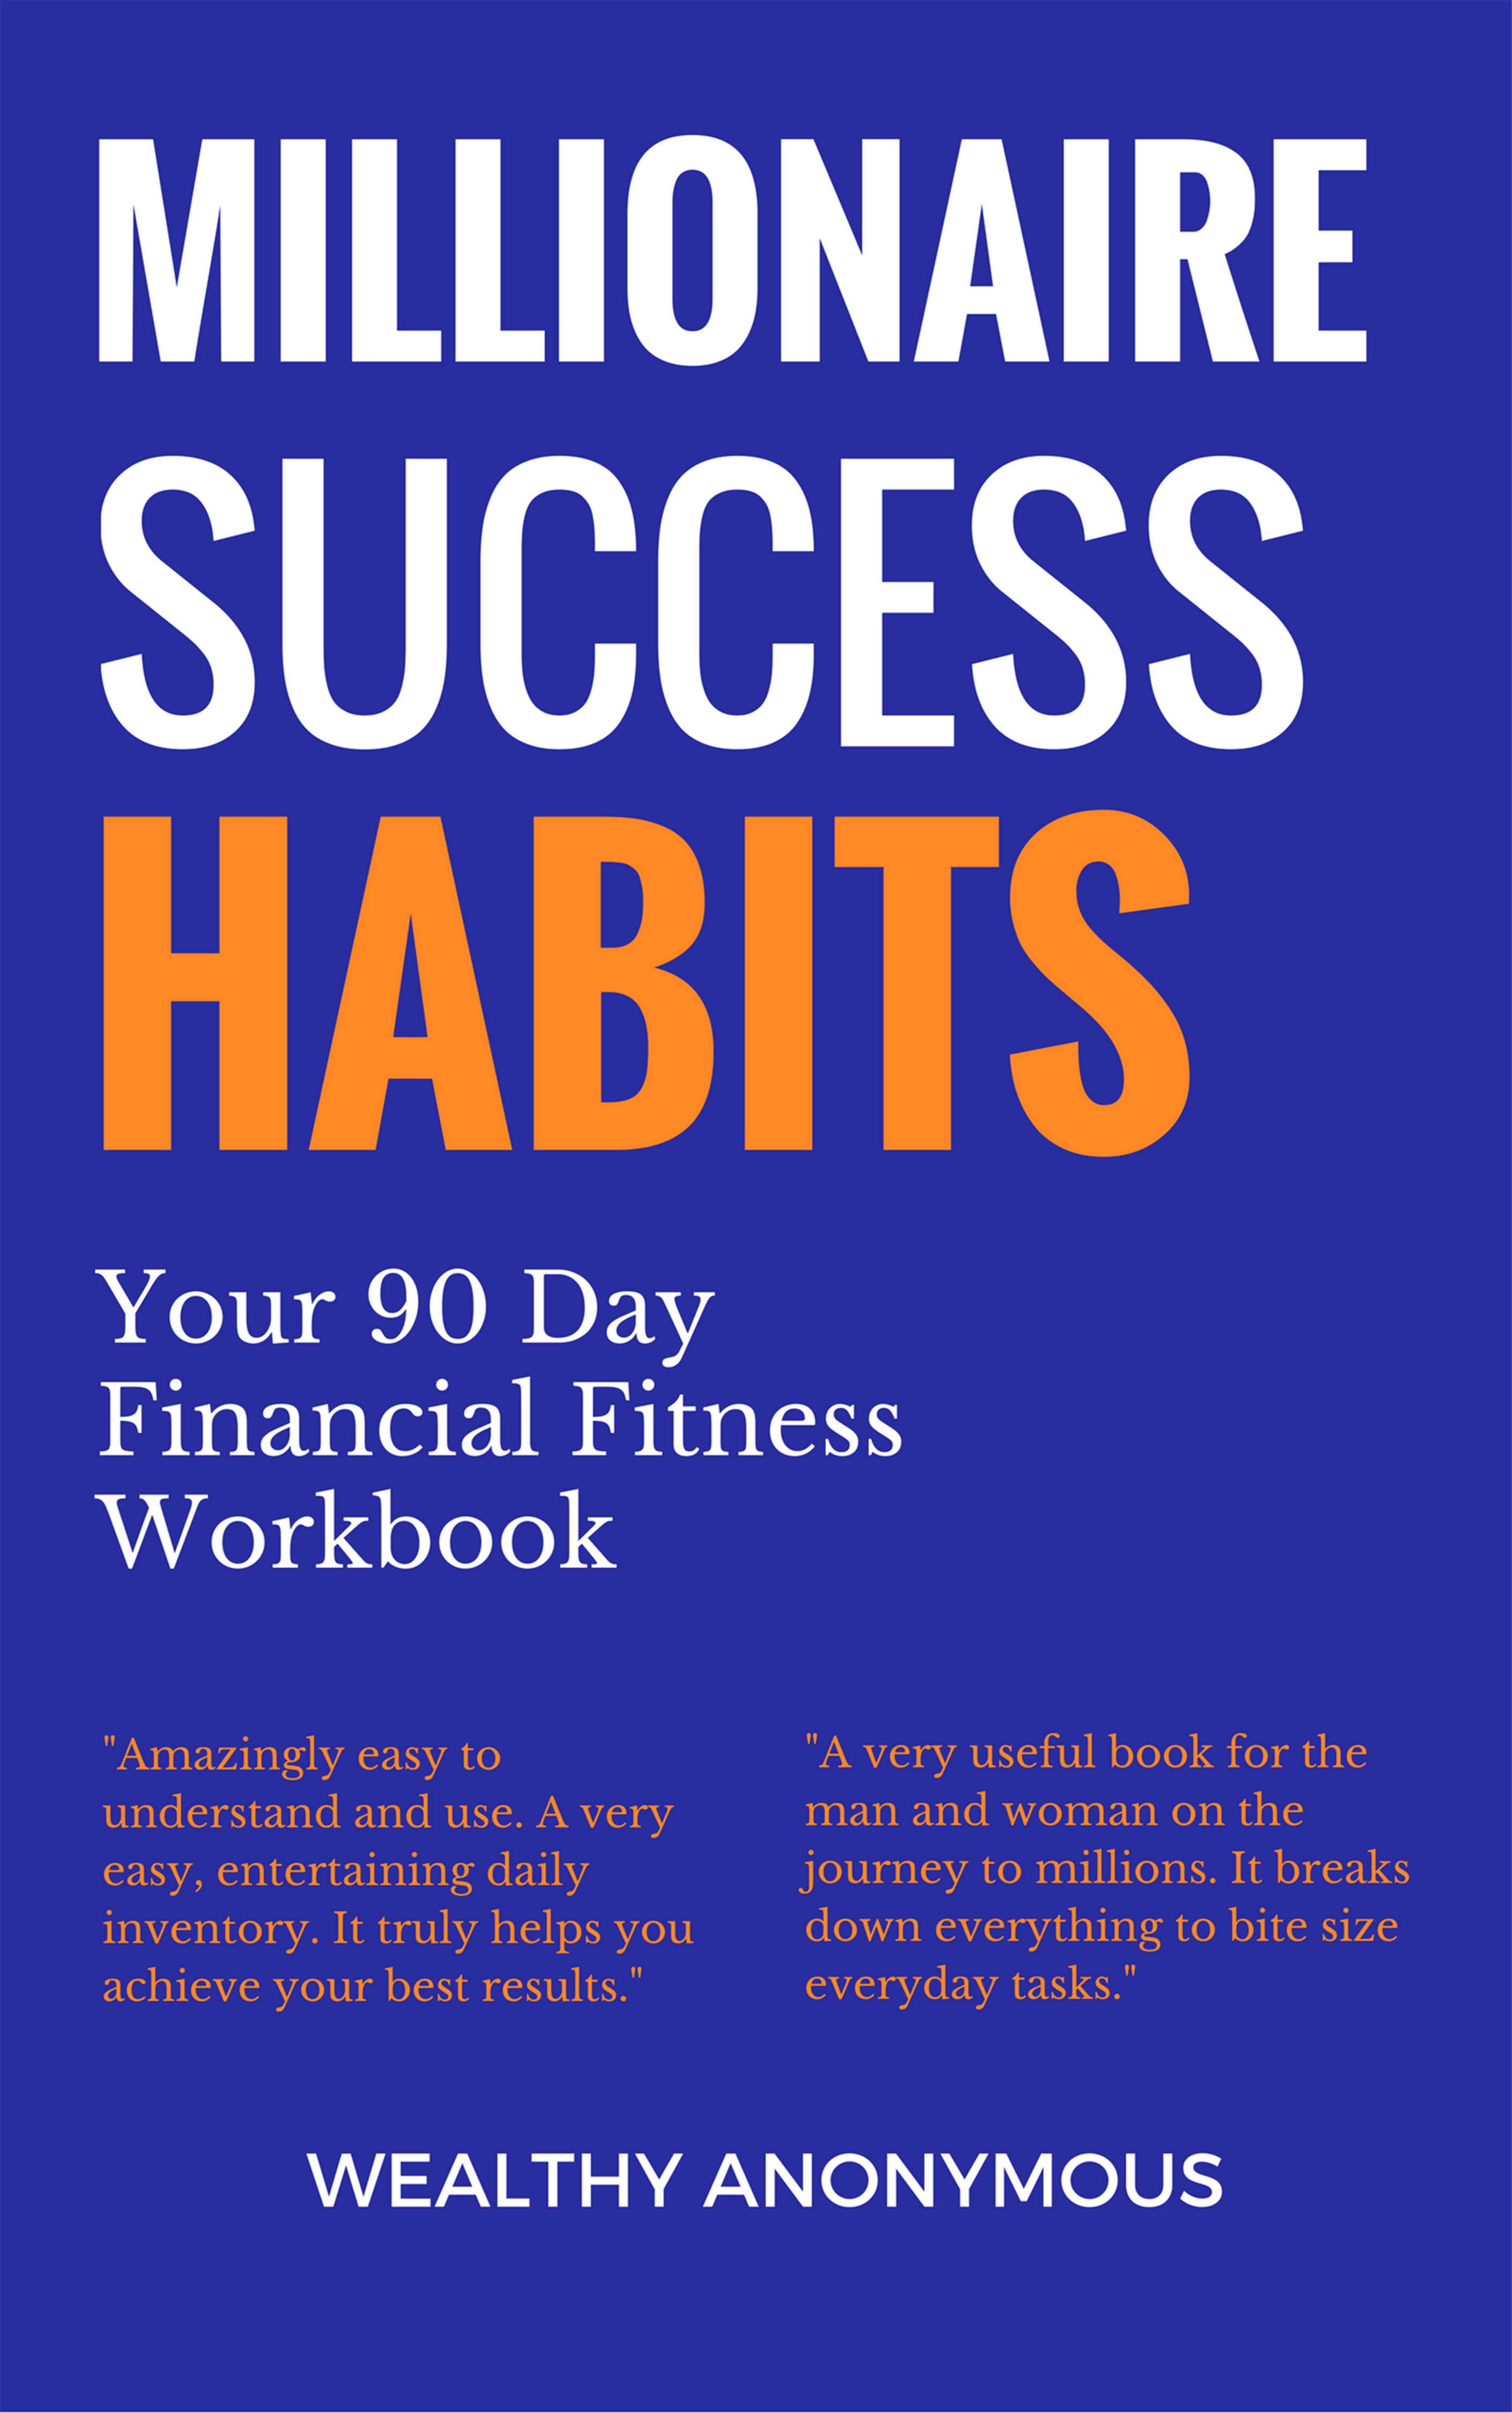 Millionaire Success Habits Book Pdf Free Download